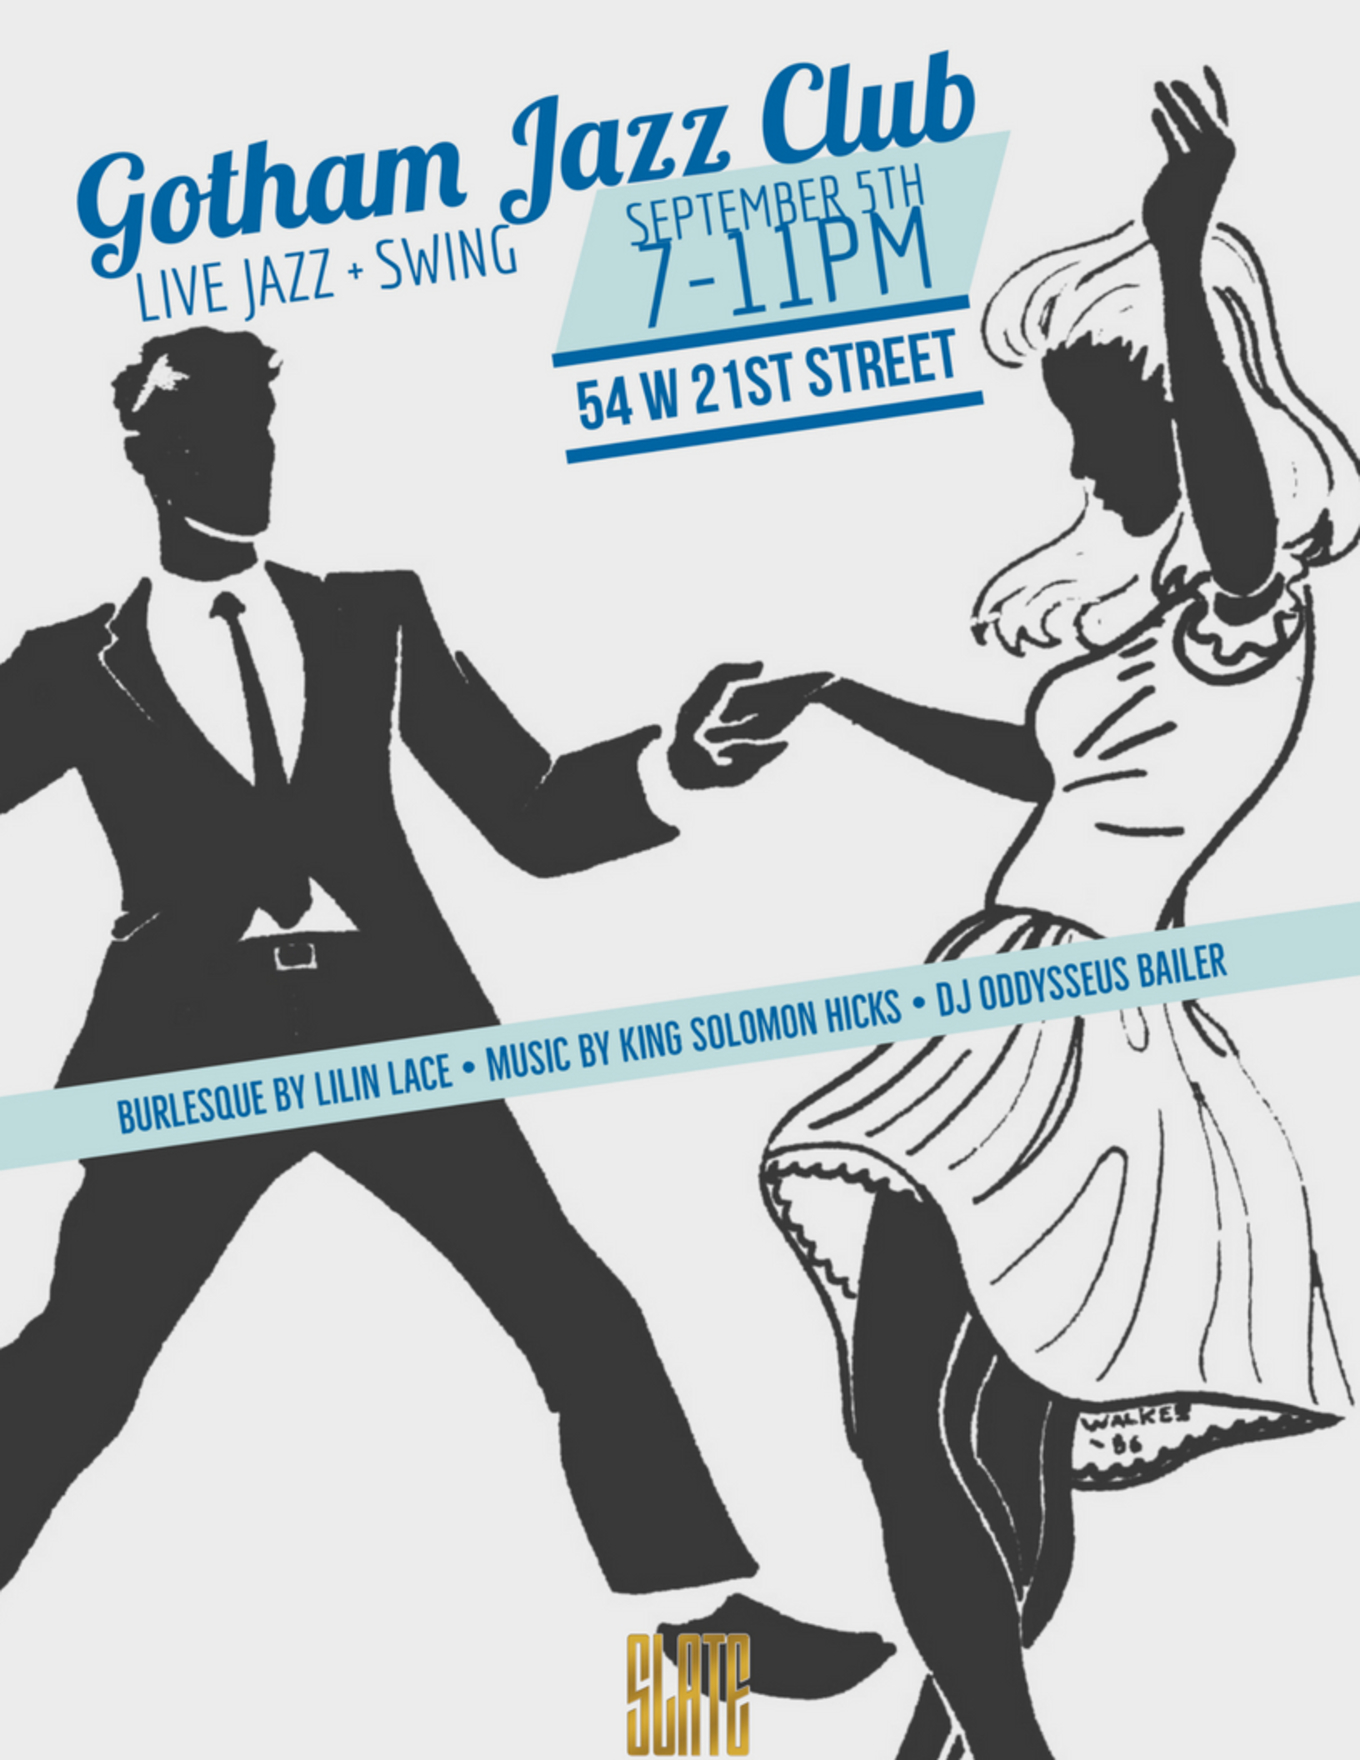 Opening Night Of Gotham Jazz Club At Slate Ny Tickets